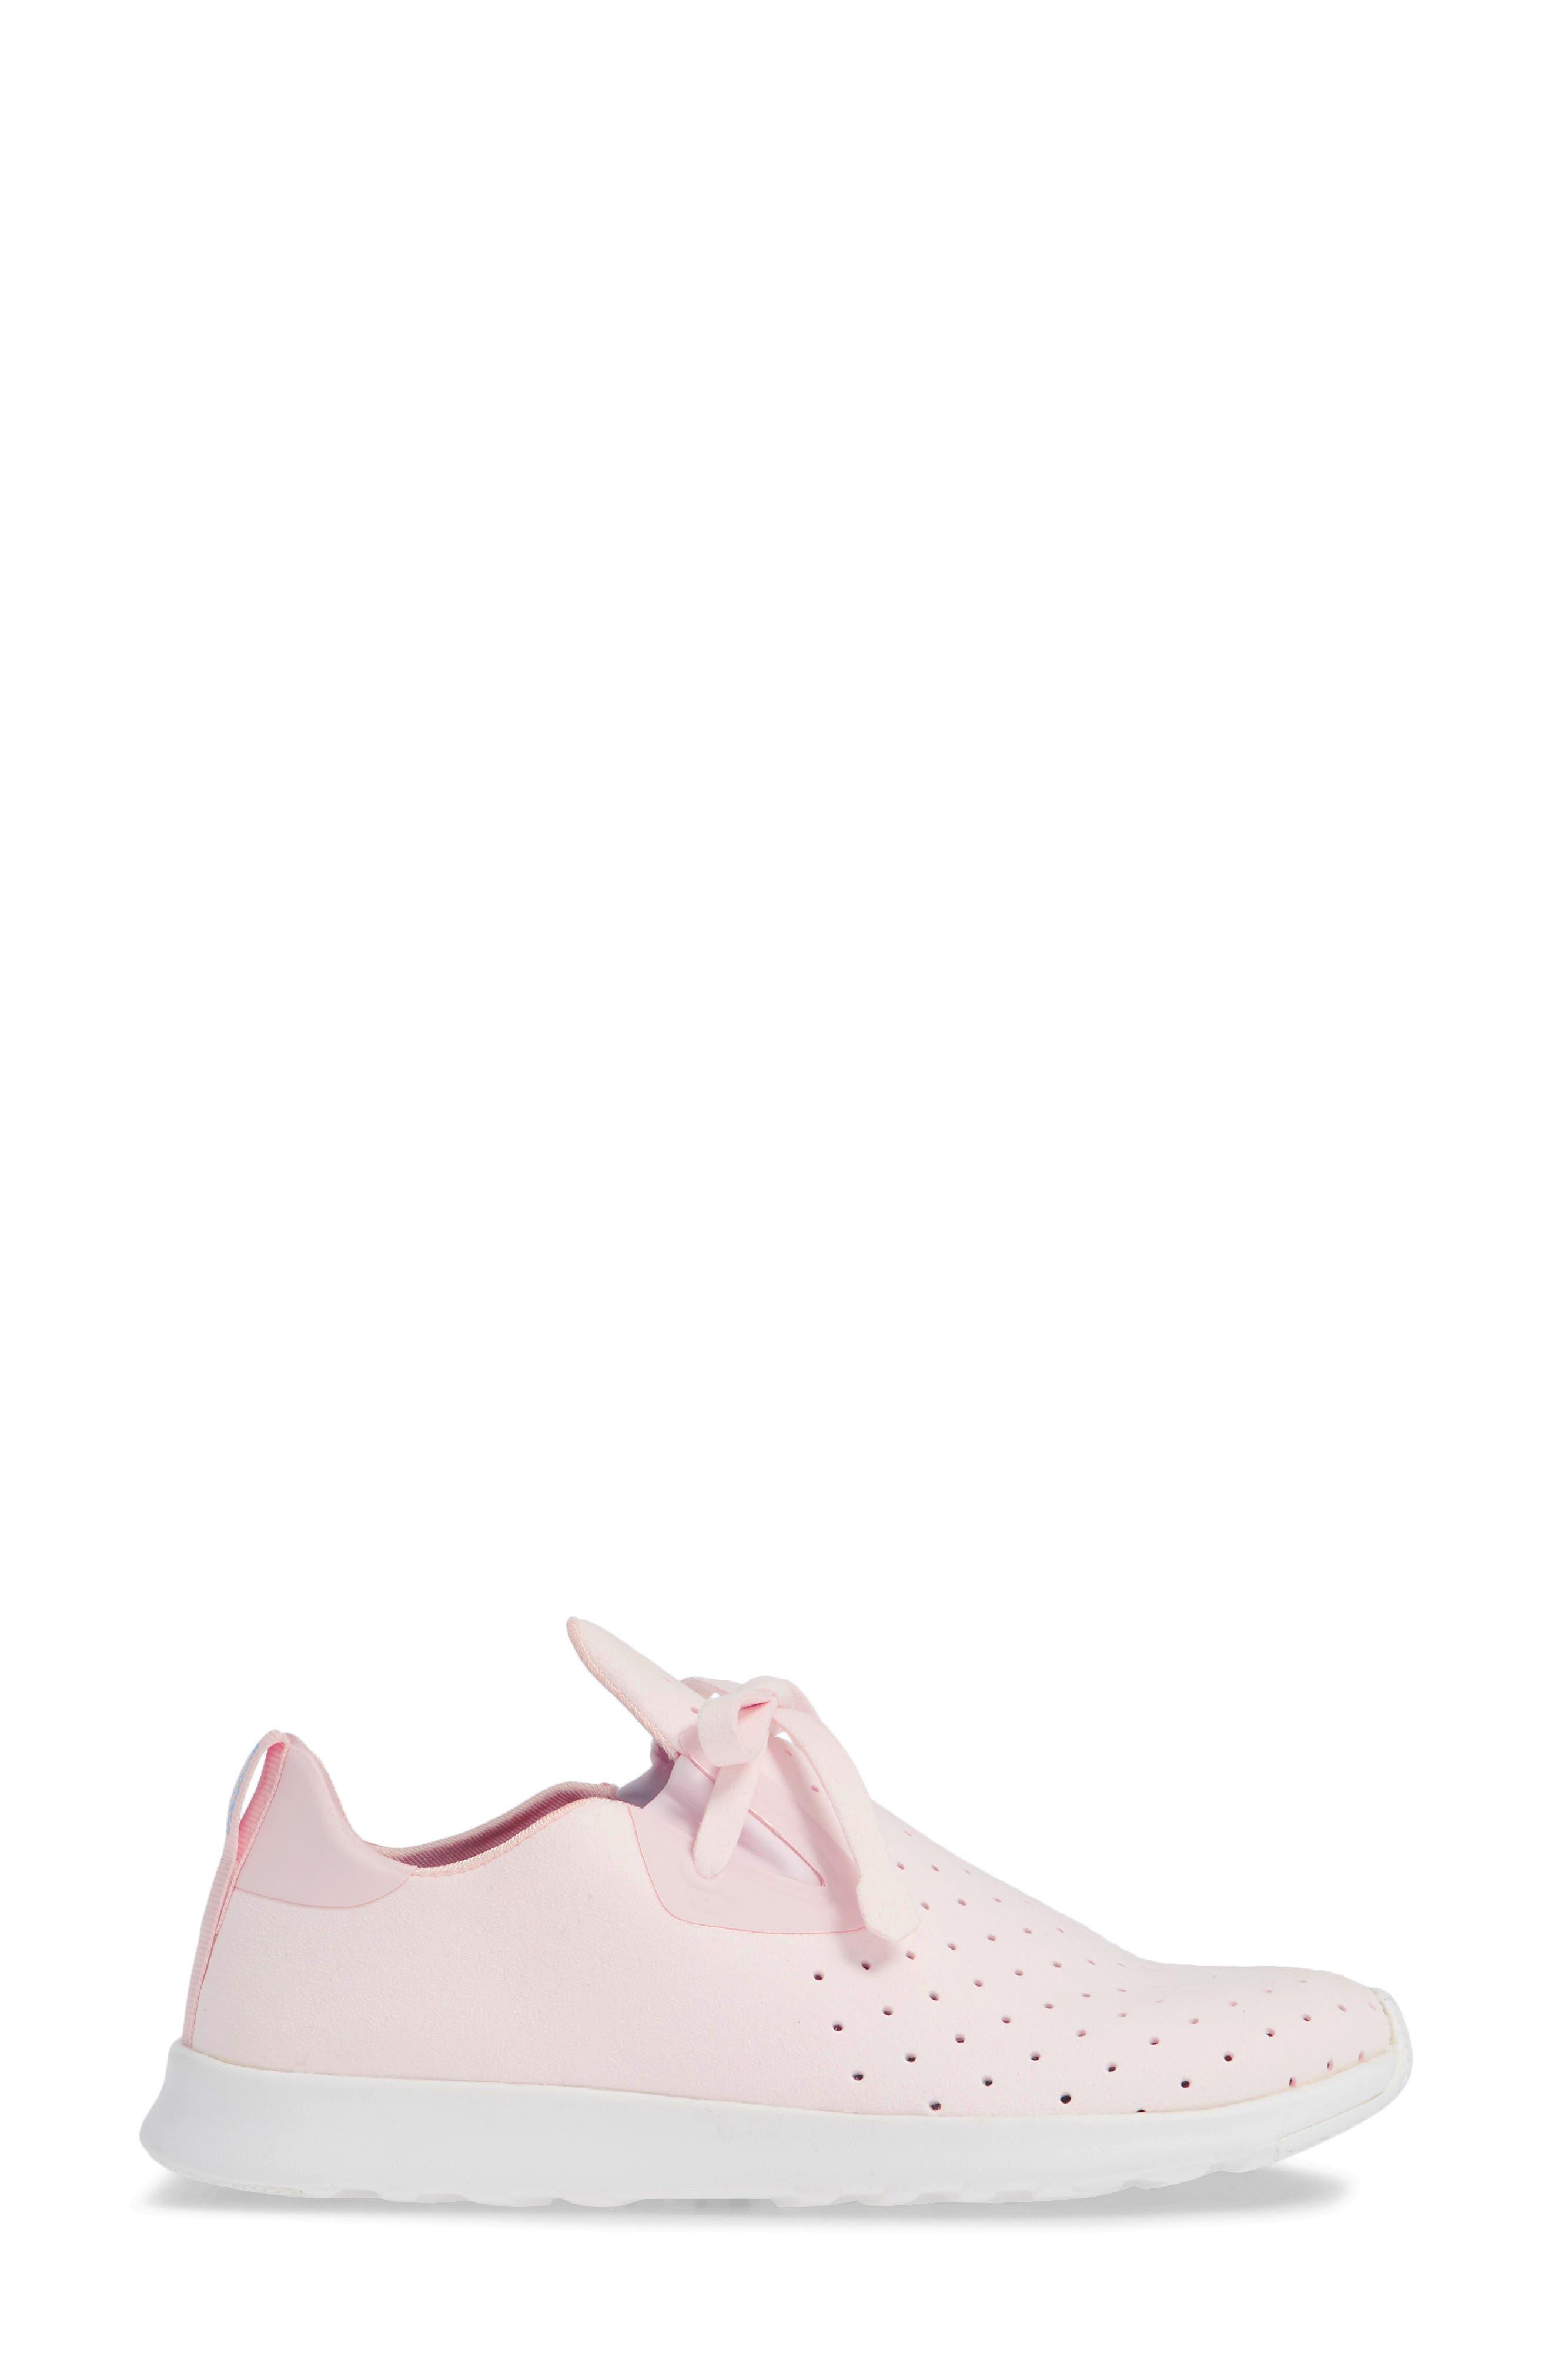 'Apollo' Perforated Sneaker,                             Alternate thumbnail 3, color,                             650